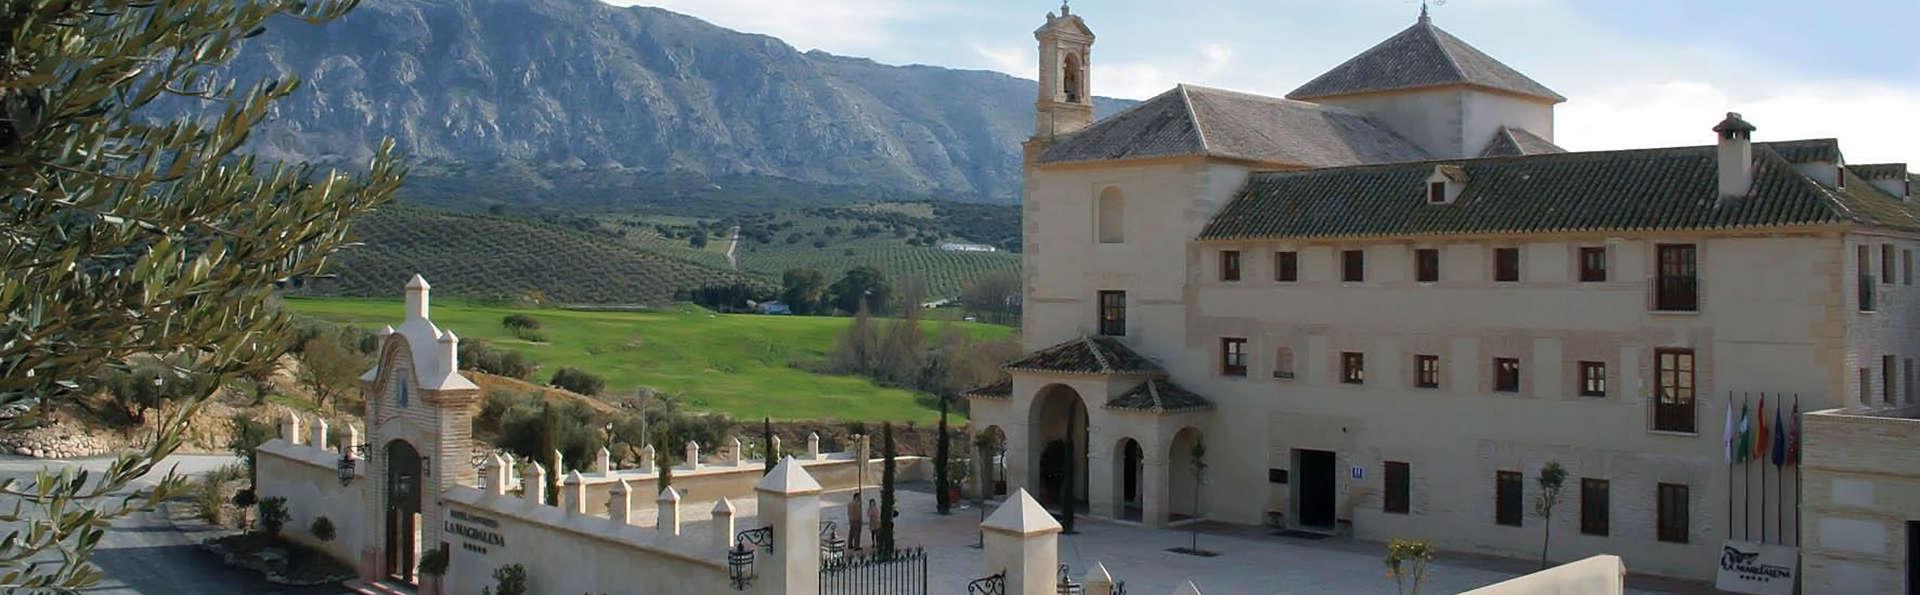 Hotel Convento La Magdalena by Checkin - edit_front_convent.jpg